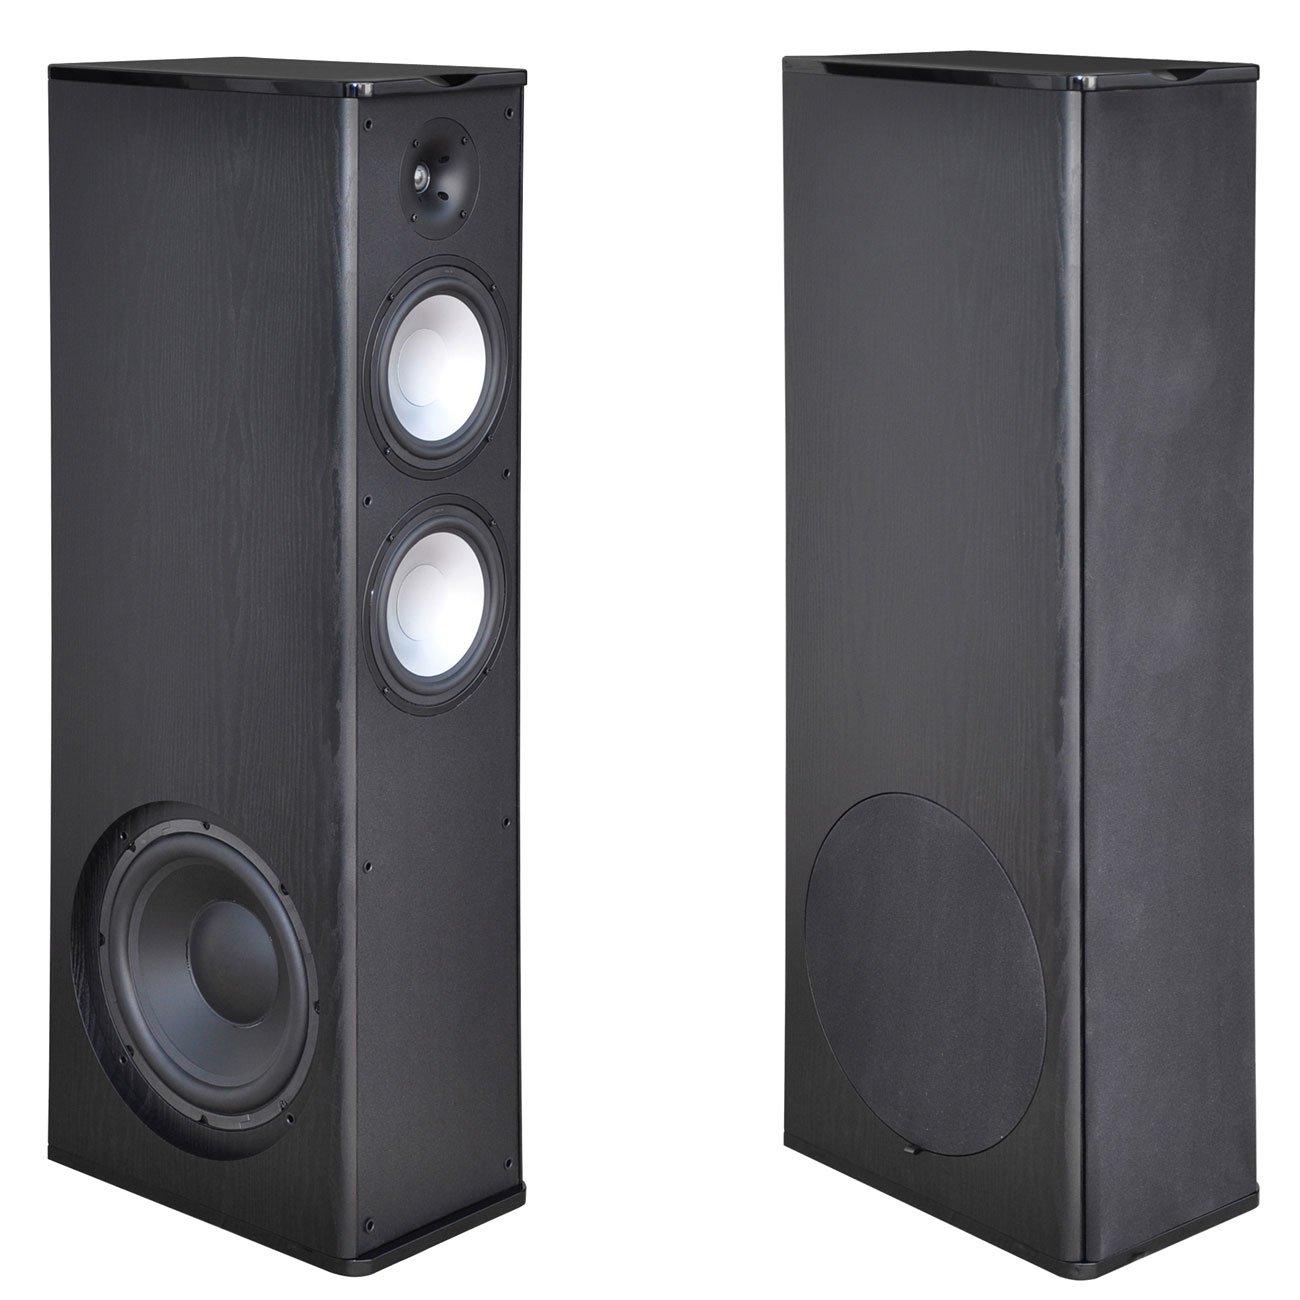 Premier Acoustic pa8.12タワースピーカー(ペア) B00JJ21UDG